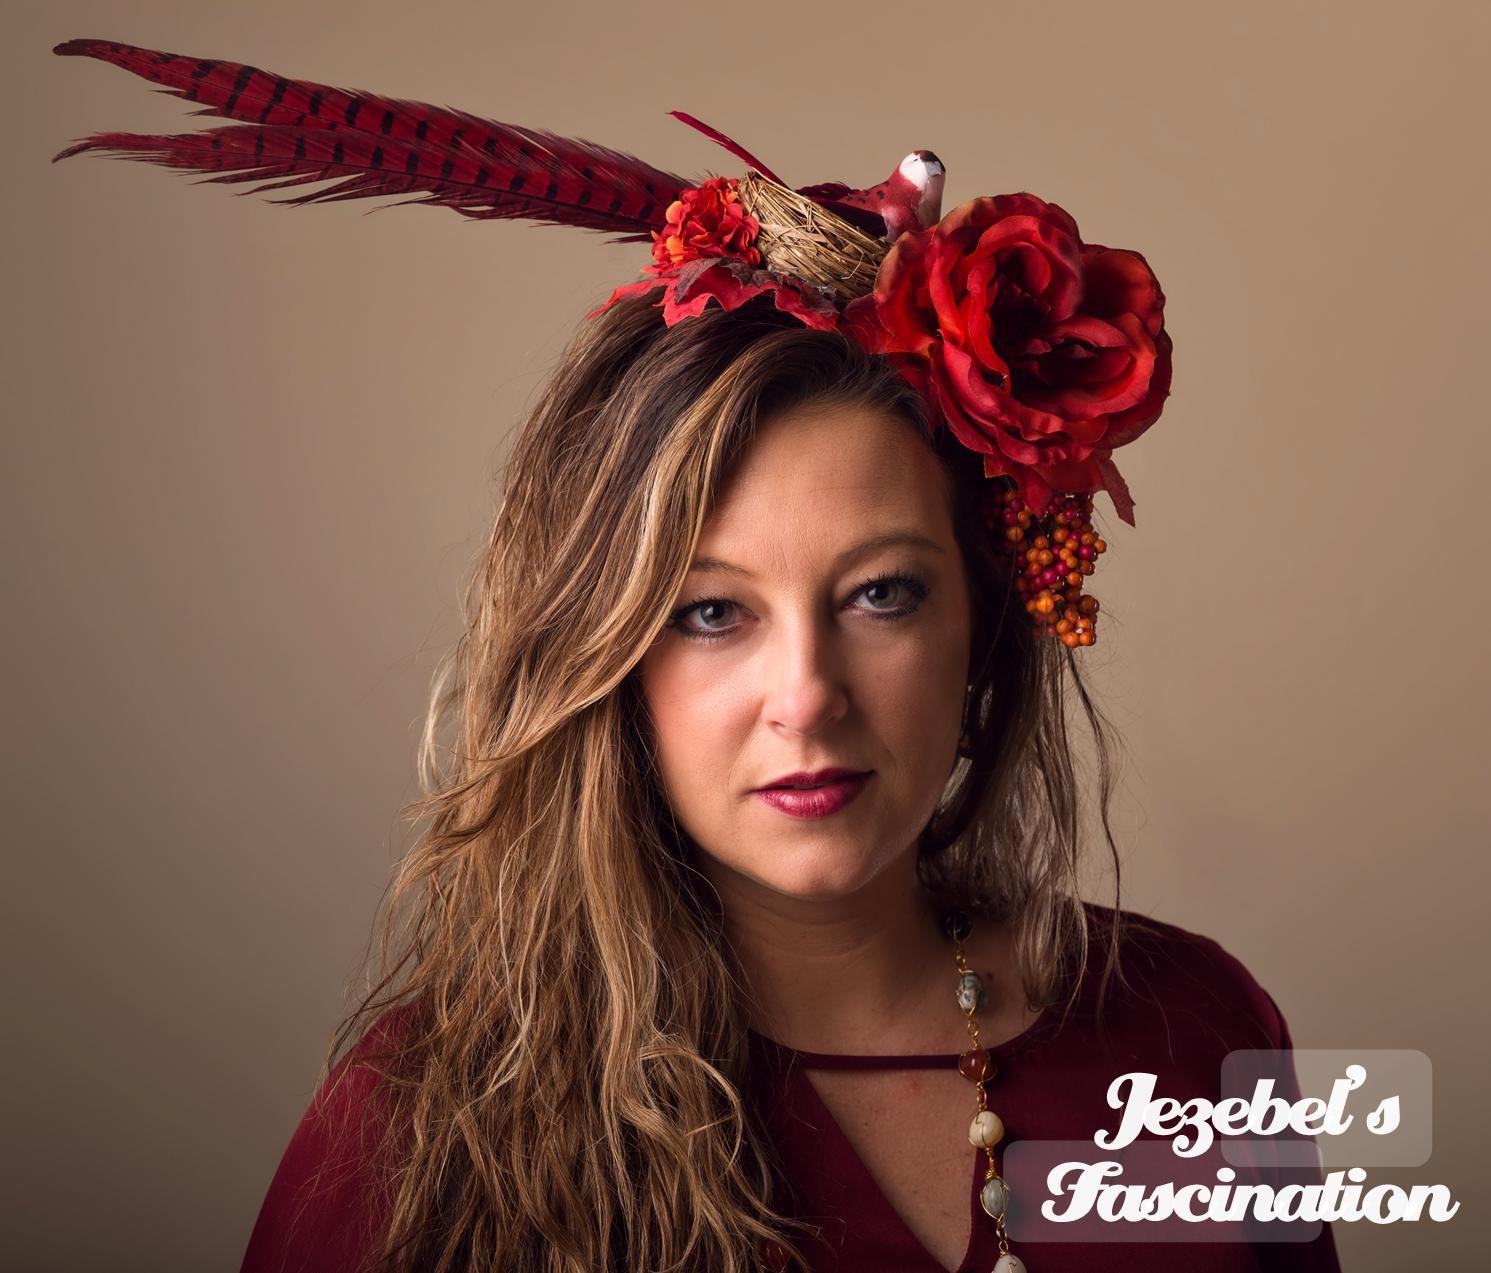 Demeter Harvest Boho Feather Flower Headdress Southwestern Bird Nest Red  Rust Pheasant Floral Fascinator Autumn Fall Maple Rose Headpiece 573f0ac8823